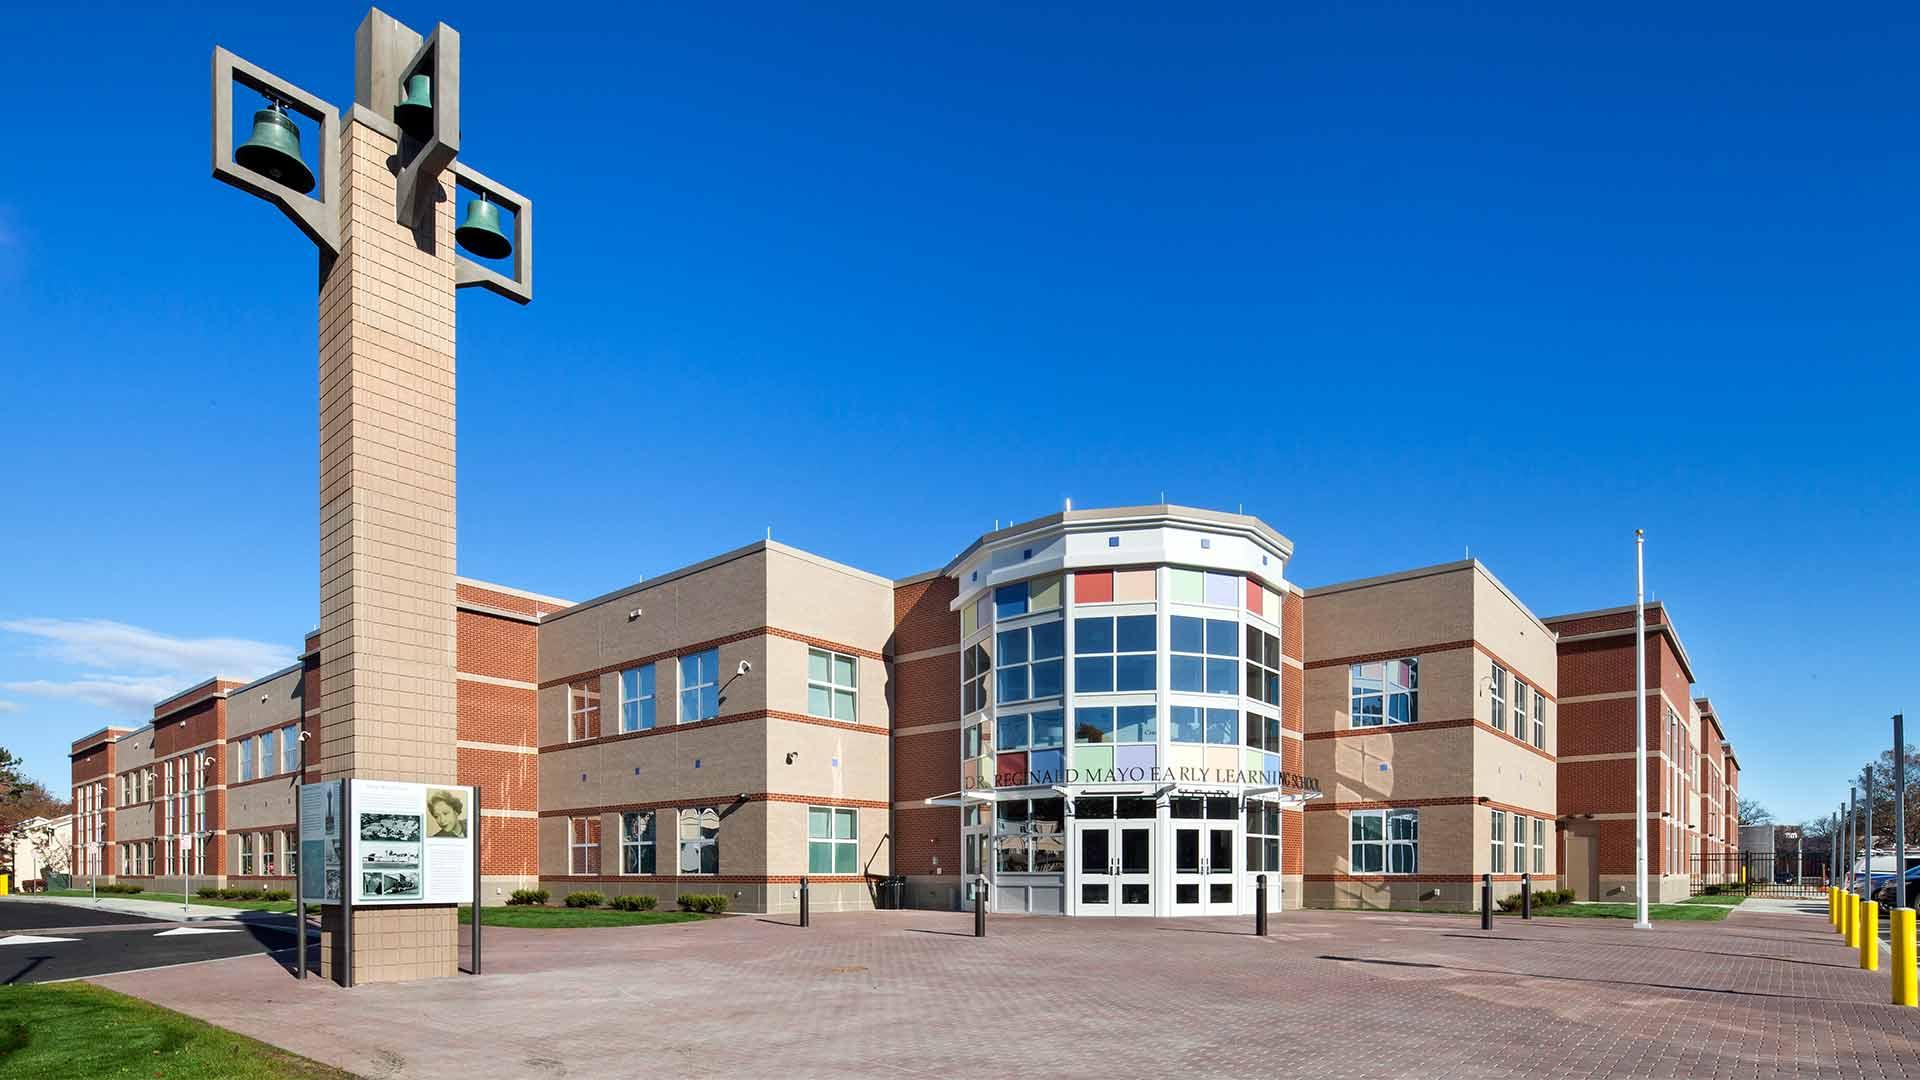 Dr_Reginald_Mayo_School_Entrance_BG.jpg